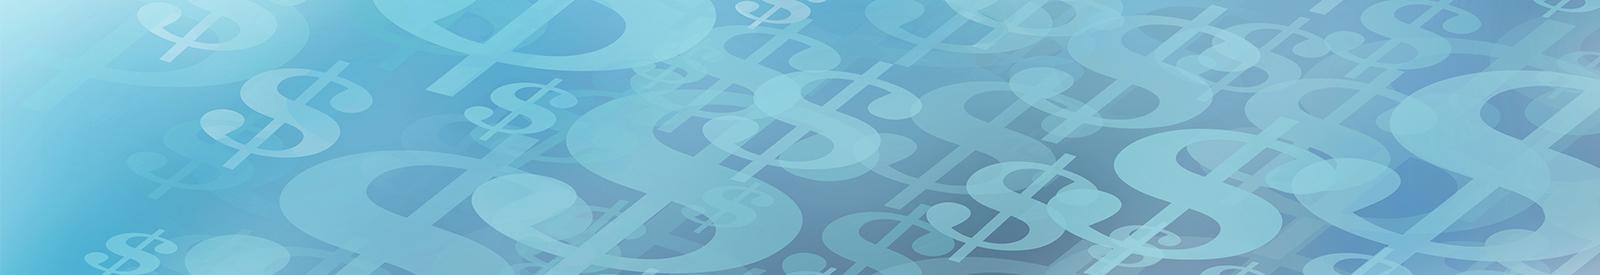 blue dollar sign design